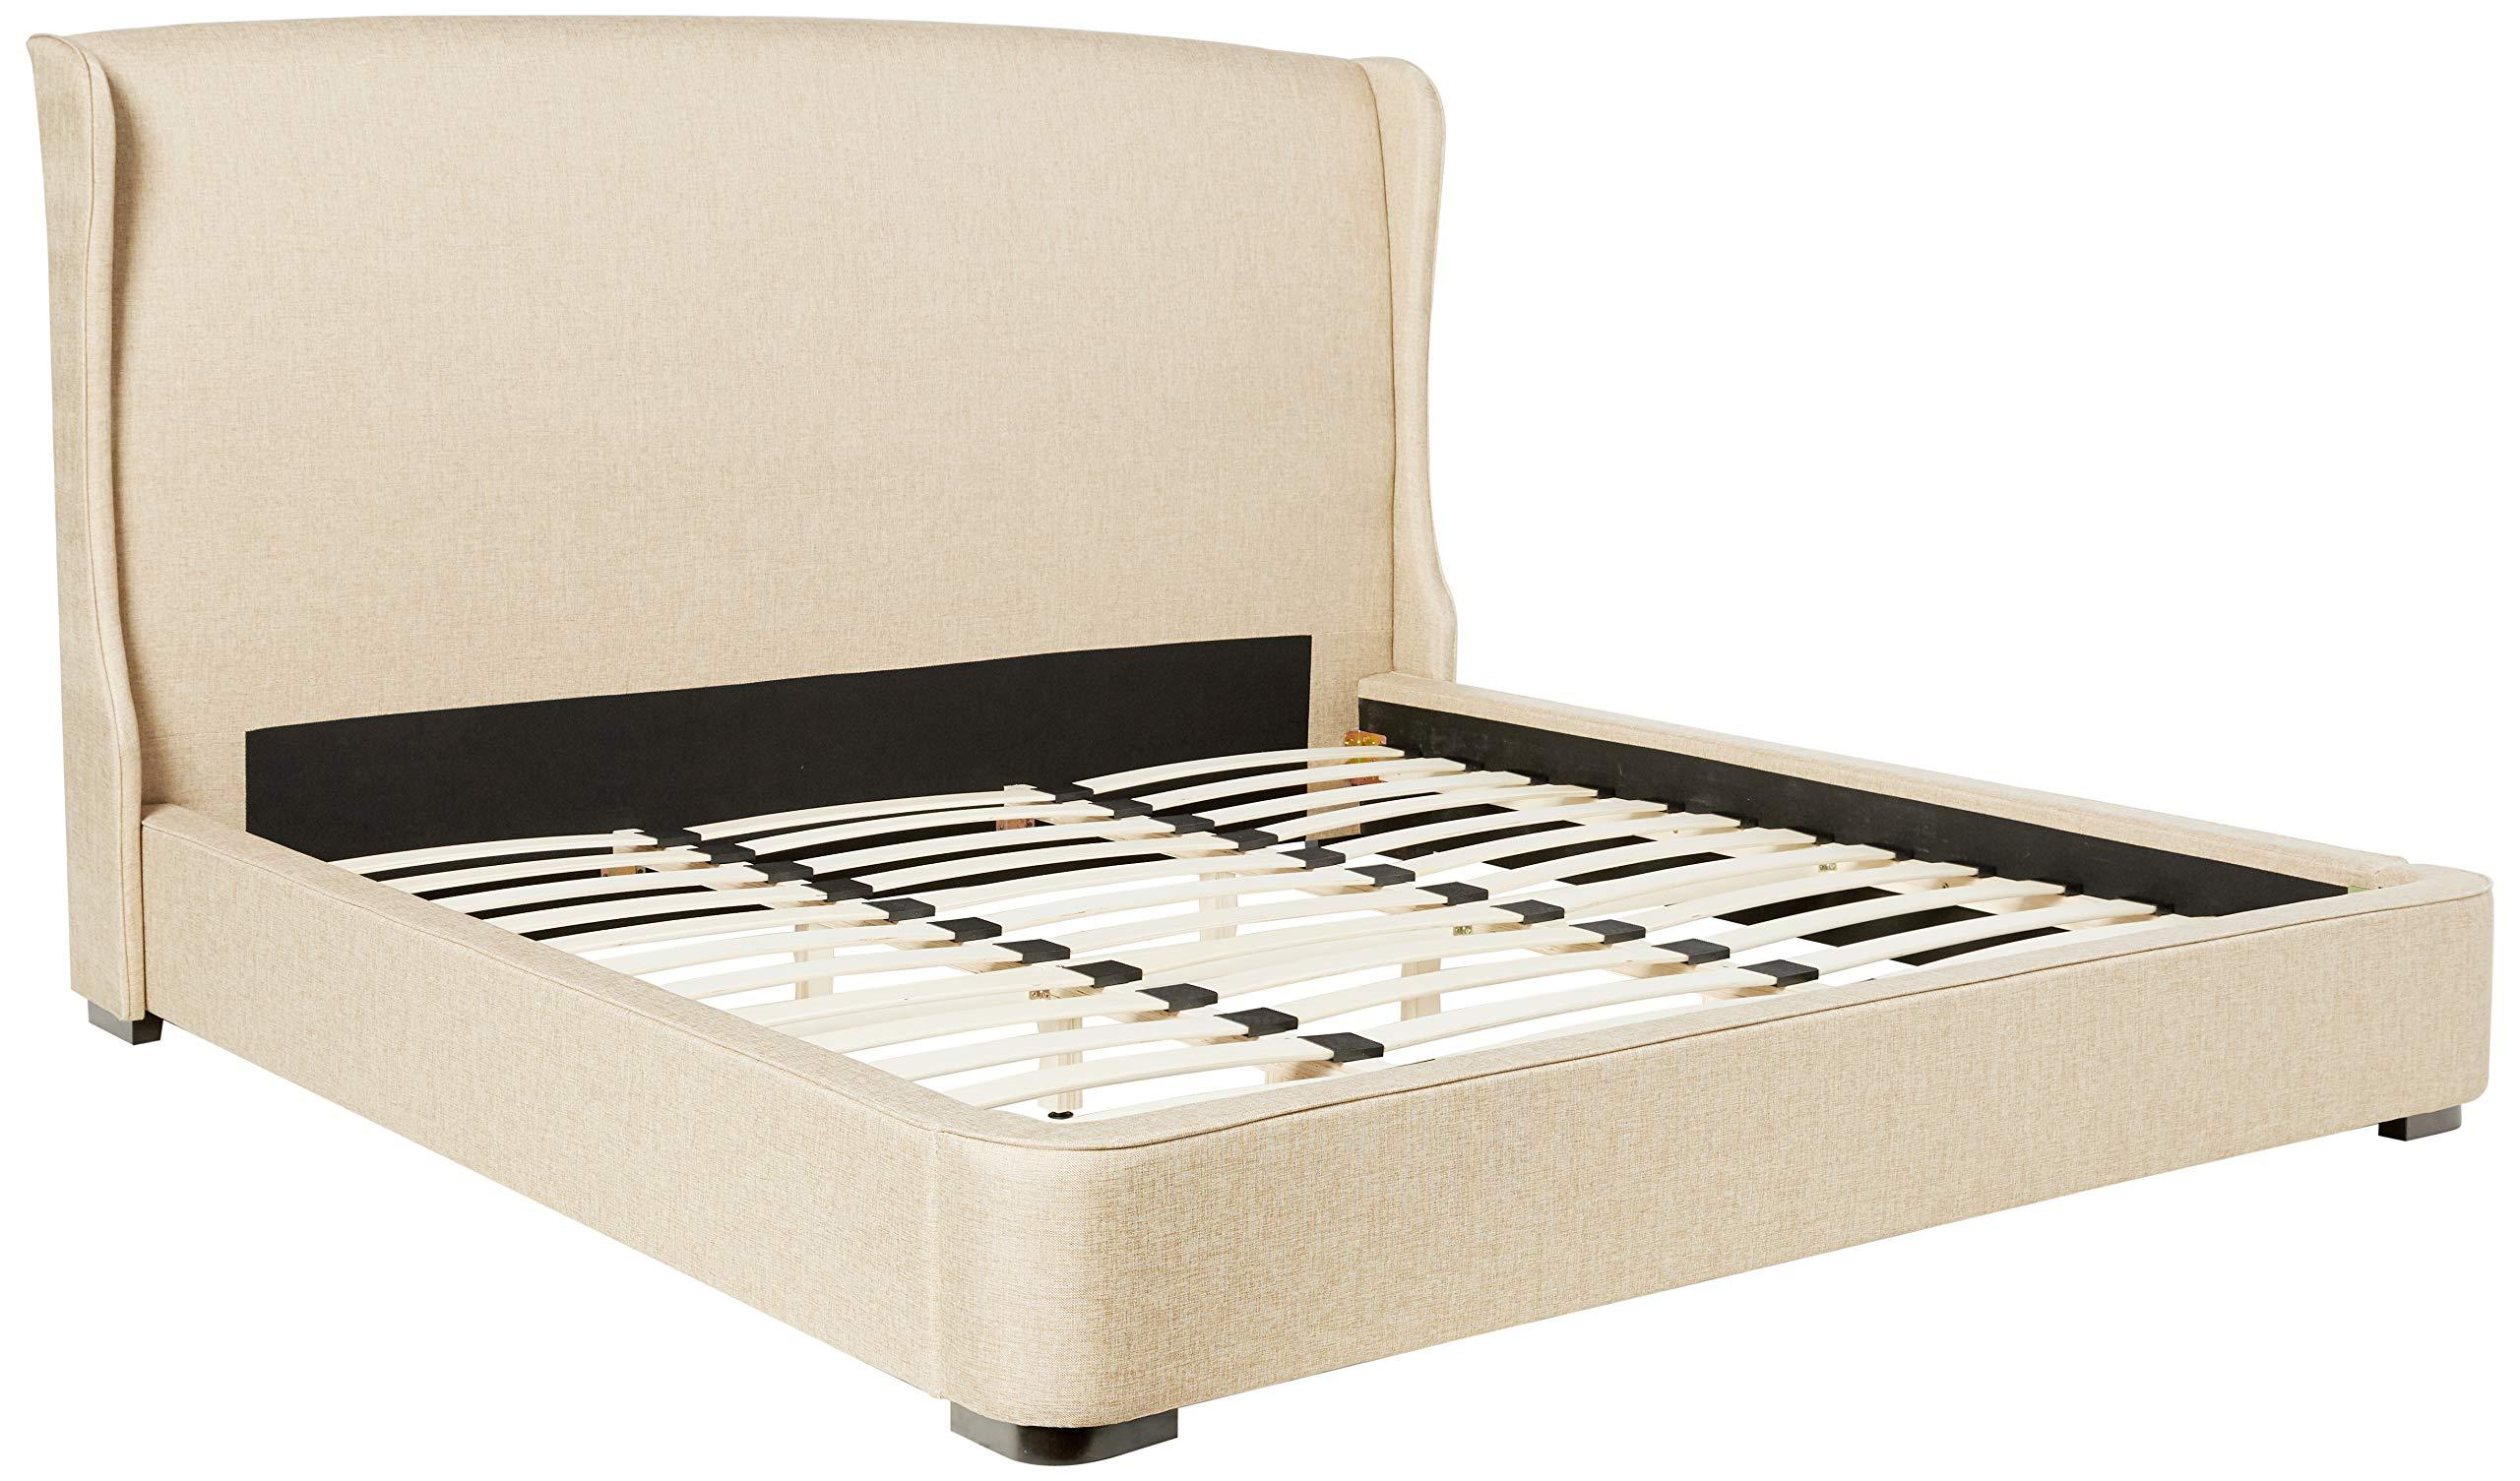 Baxton Studio Sheila Linen Modern Bed With Upholstered Headboard King Tan